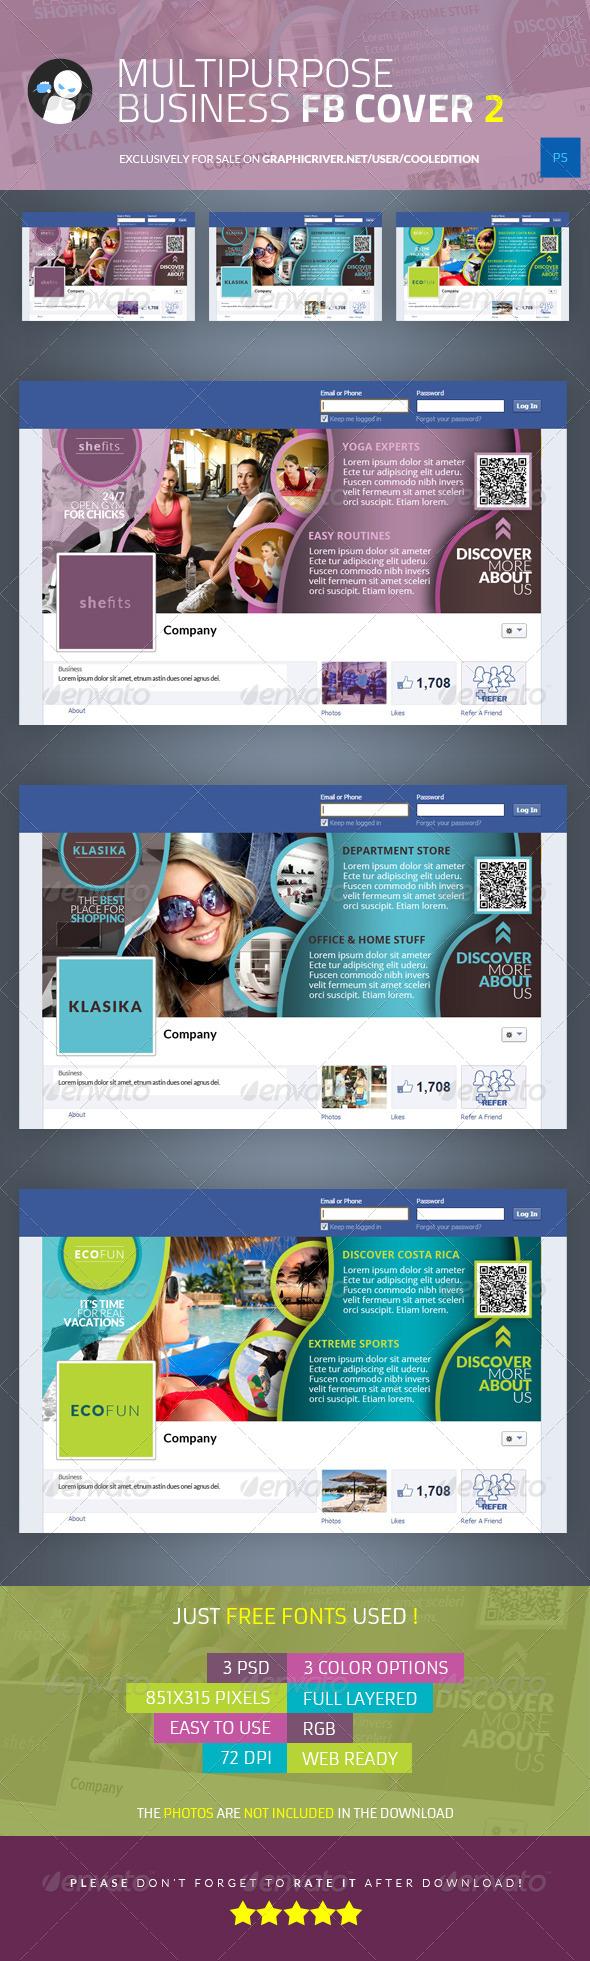 GraphicRiver Multipurpose Business Facebook Cover 2 5990493